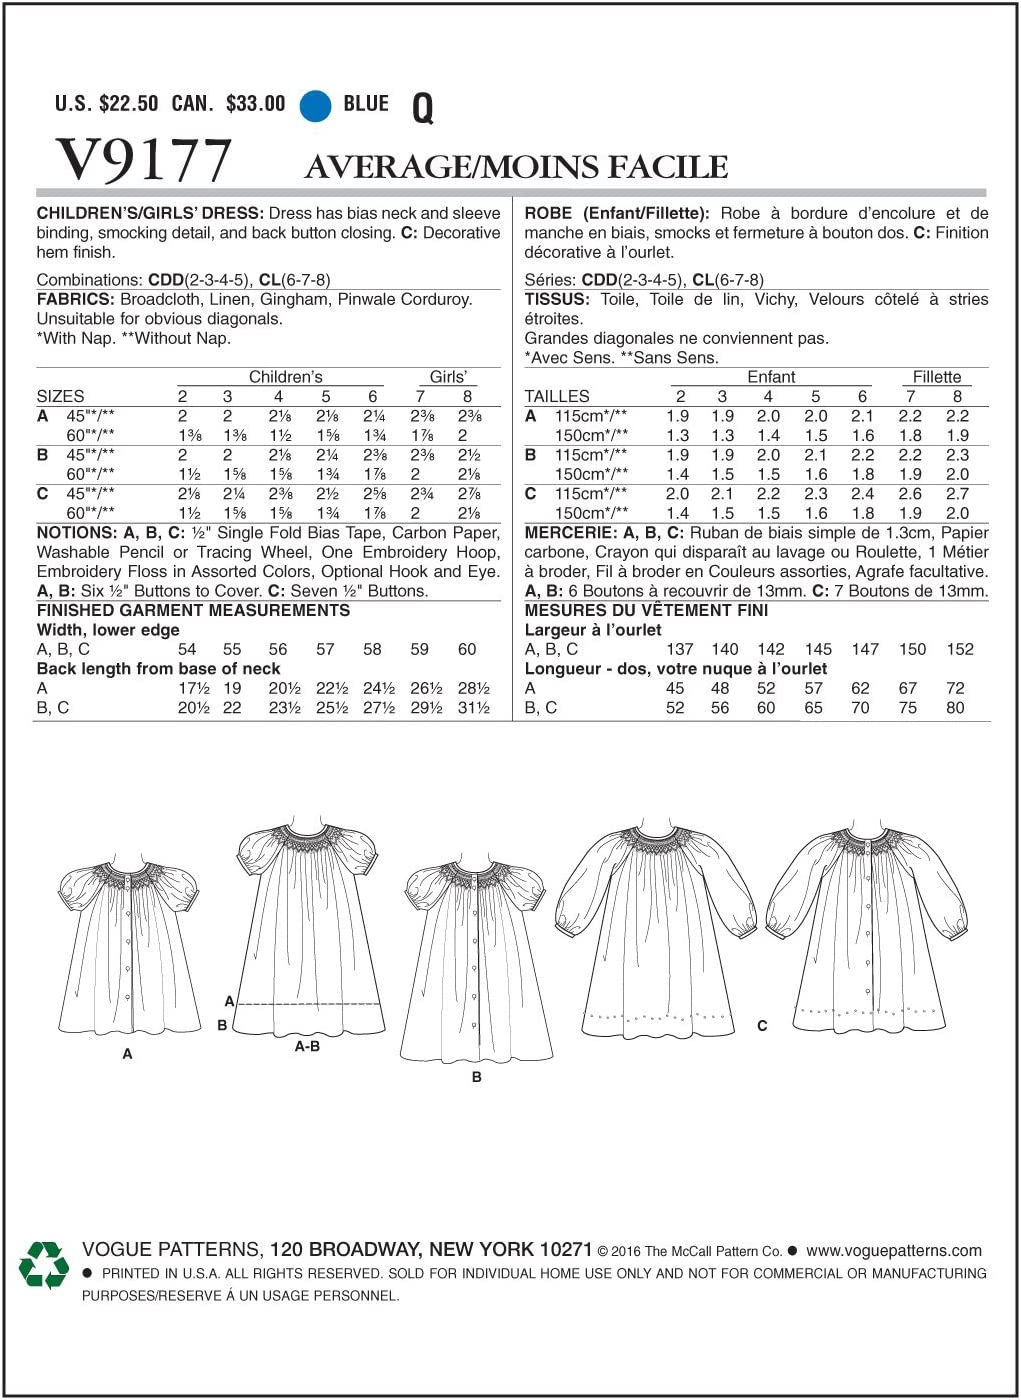 6-7-8 VOGUE PATTERNS 9177 CL,Childrens//Girls Dress,Sizes 6-8 Multi-Colour,